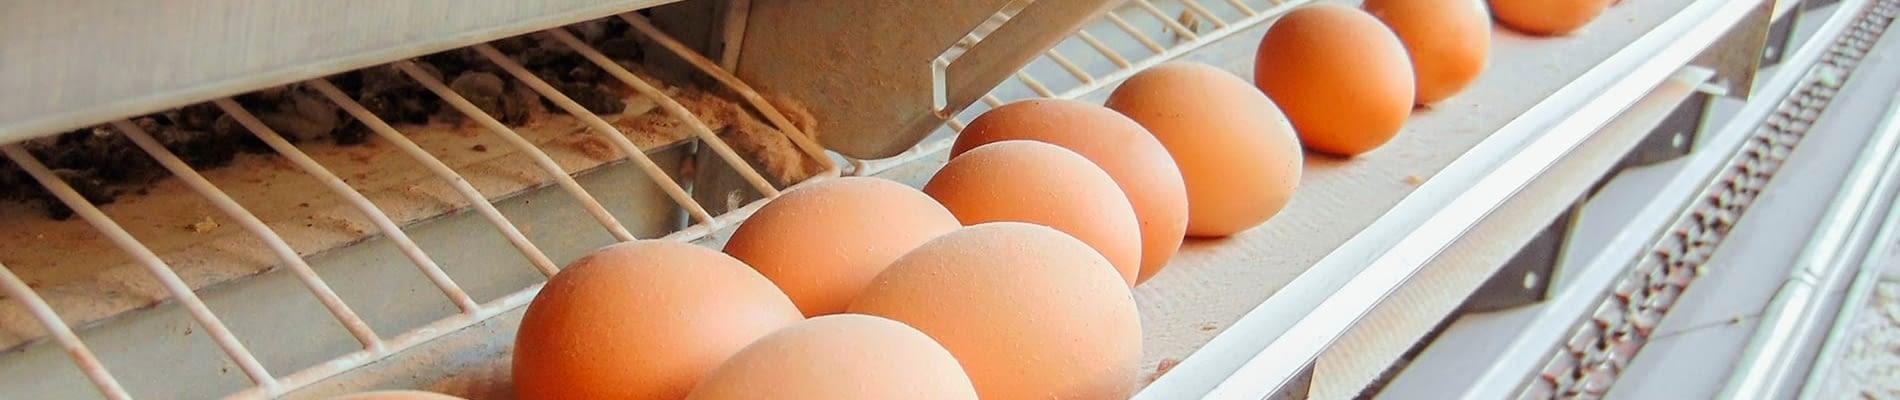 Banda transportadora recogida de huevo